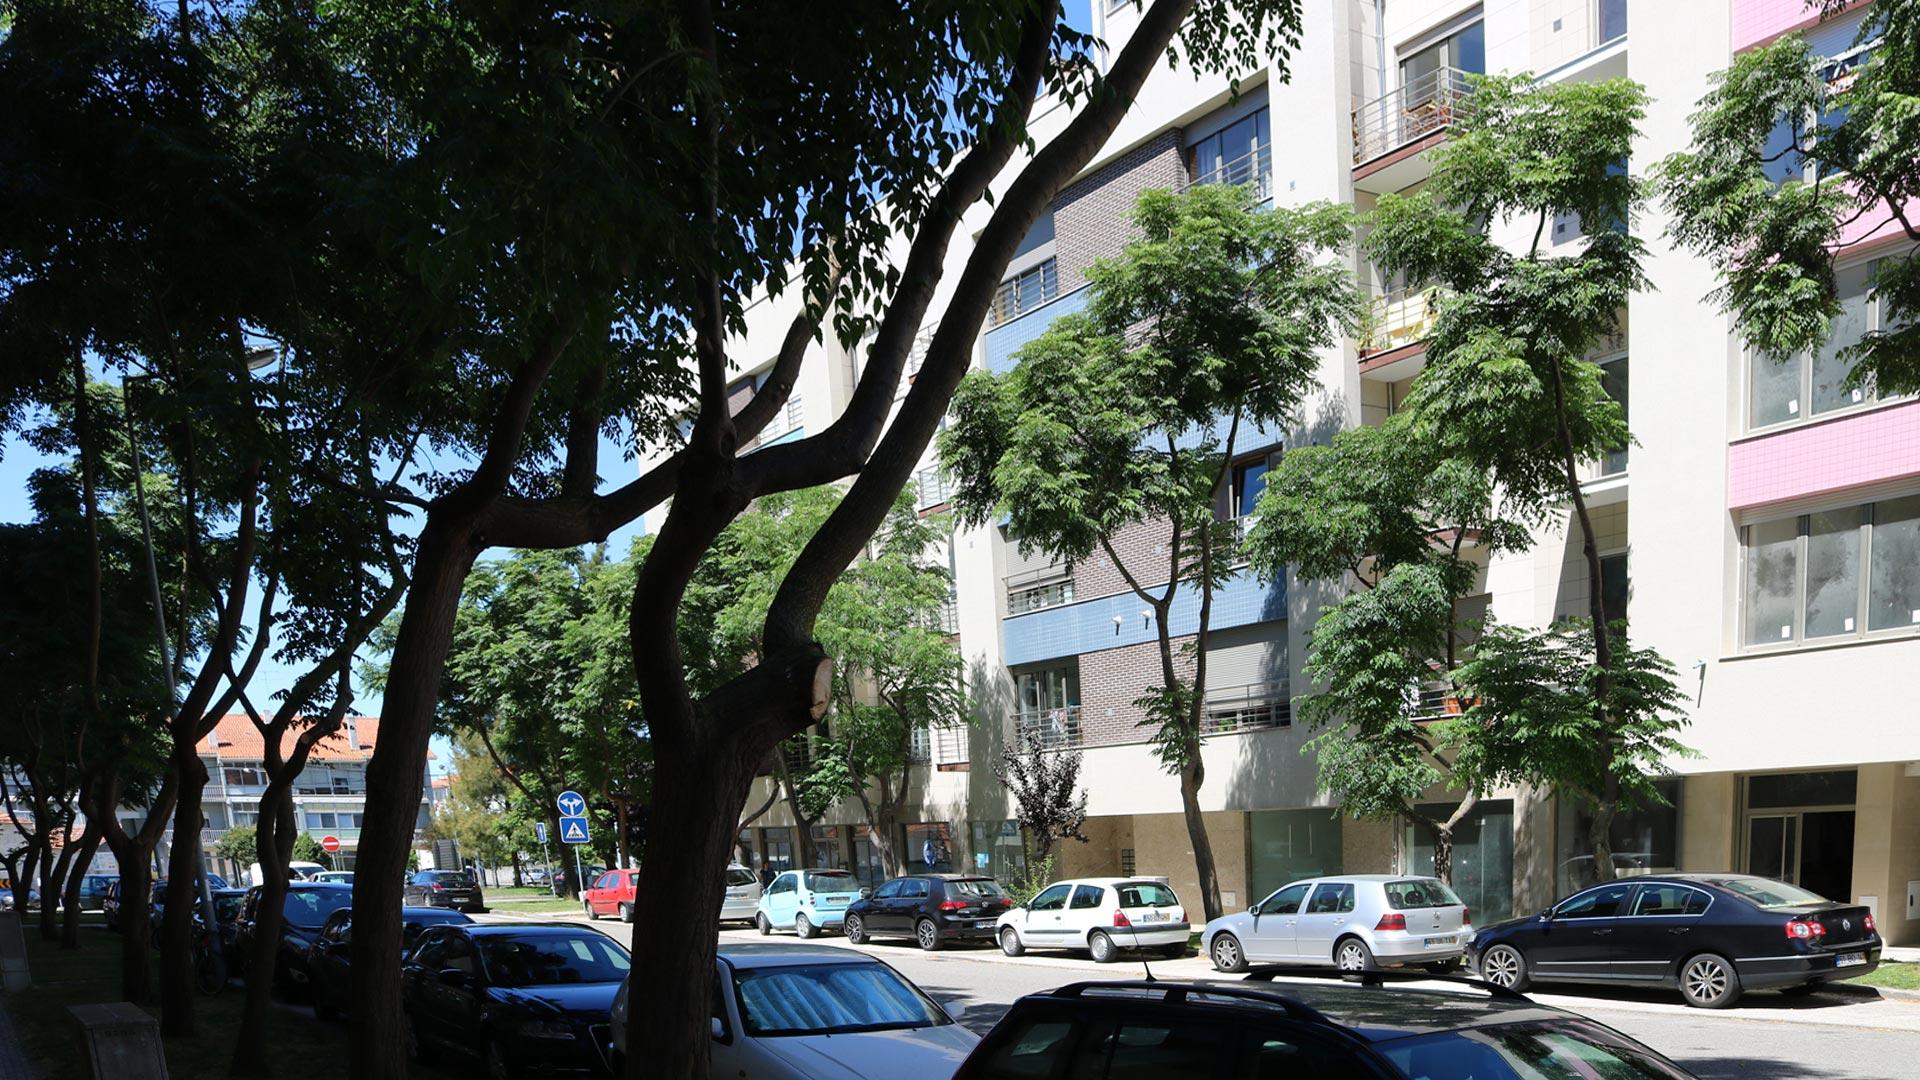 Glicinias-glória-vera-cruz-Aveiro-ville-real-estate-imobiliaria-comprar-arrendar-vender-moradia-apartamento-casa-t0-t1-t2-t3-t4-8